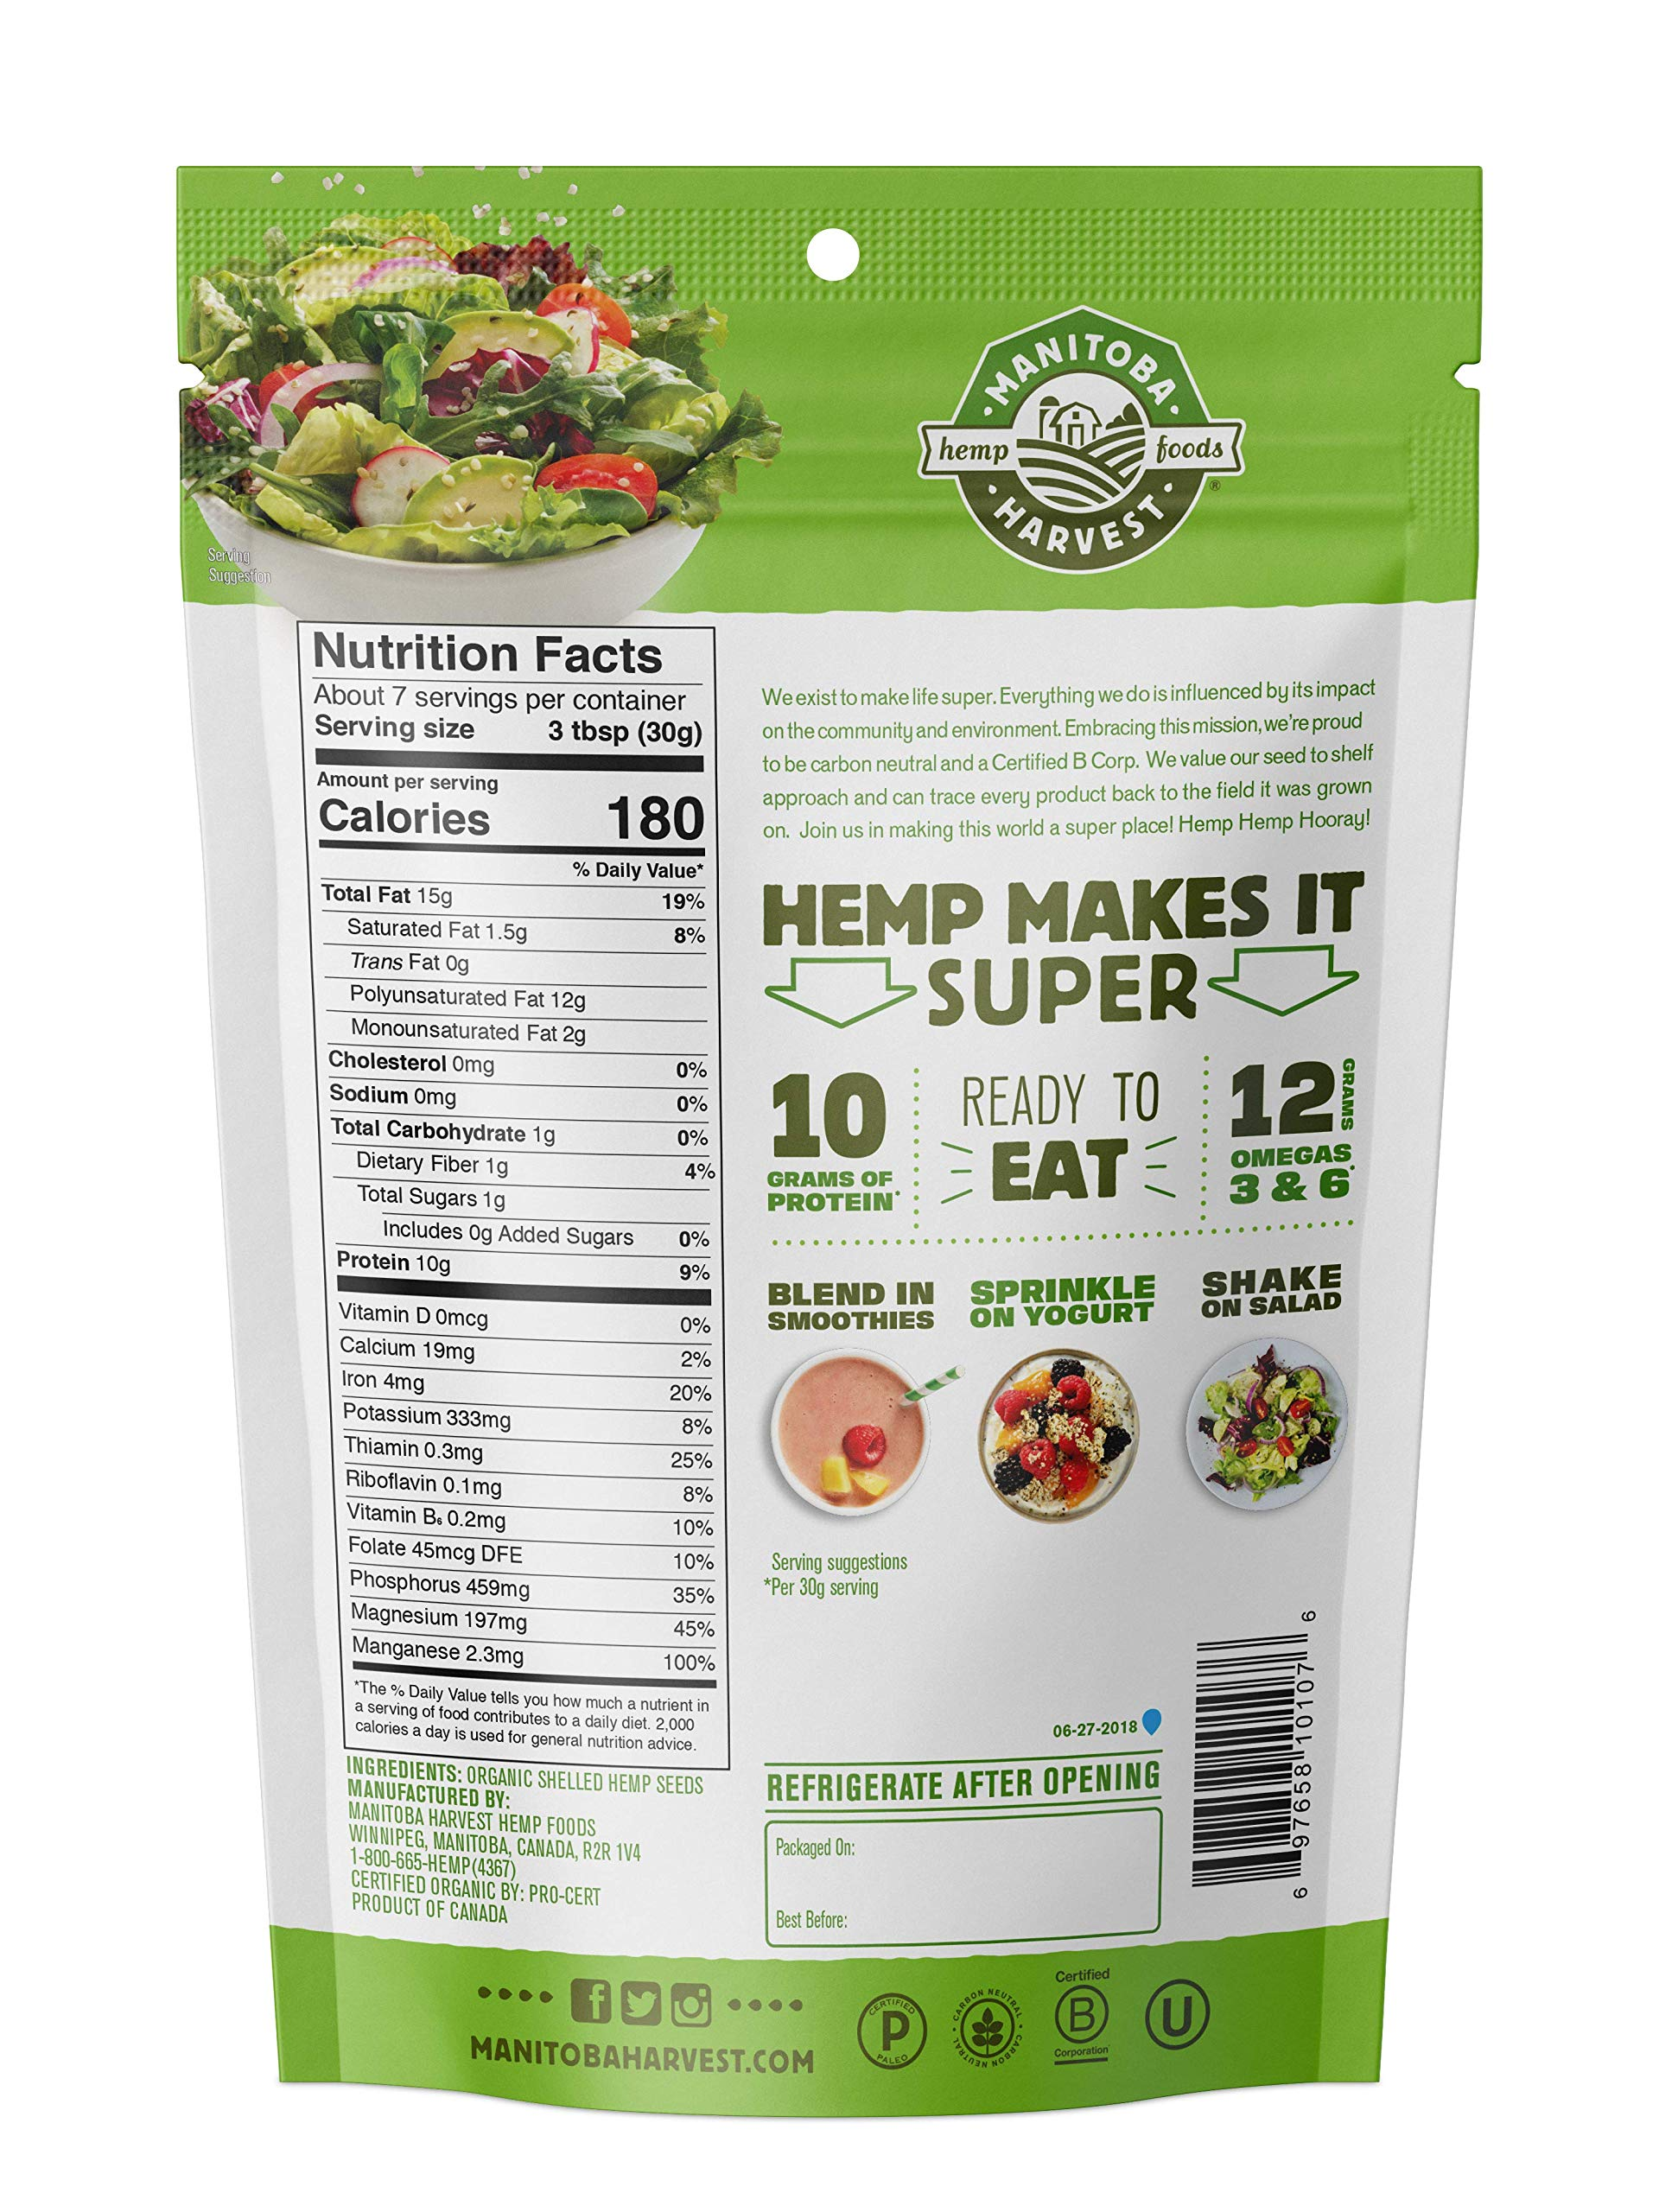 Manitoba Harvest Organic Hemp Hearts Raw Shelled Hemp Seeds, 7oz; with 10g Protein & 12g Omegas per Serving, Non-GMO, Gluten Free by Manitoba Harvest (Image #2)